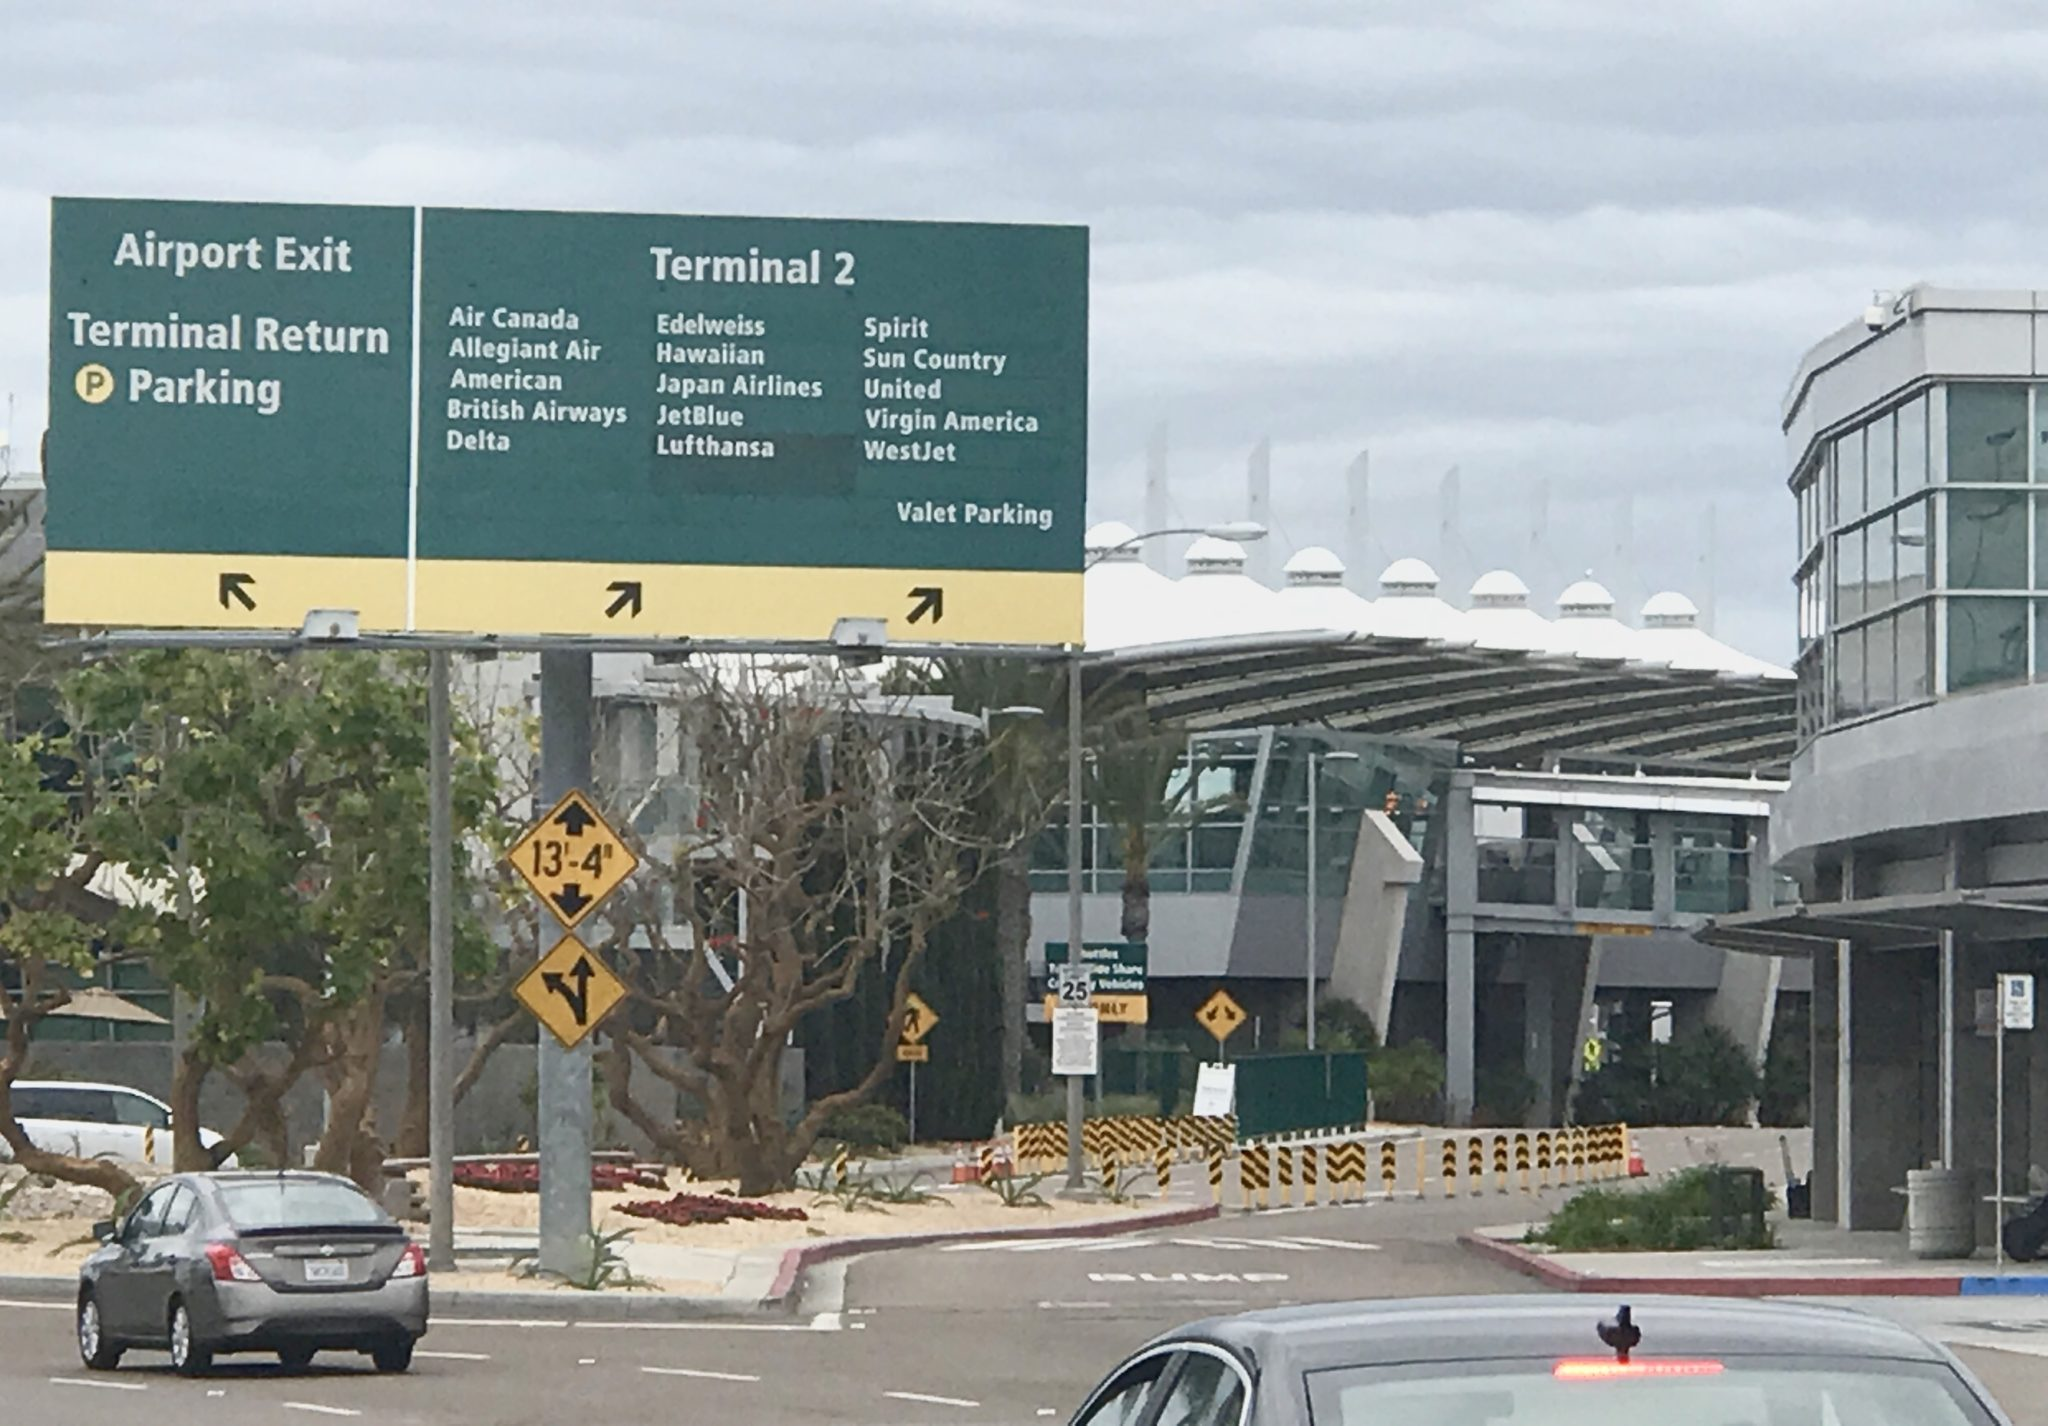 Terminal 1 & 2 at San Diego Airport